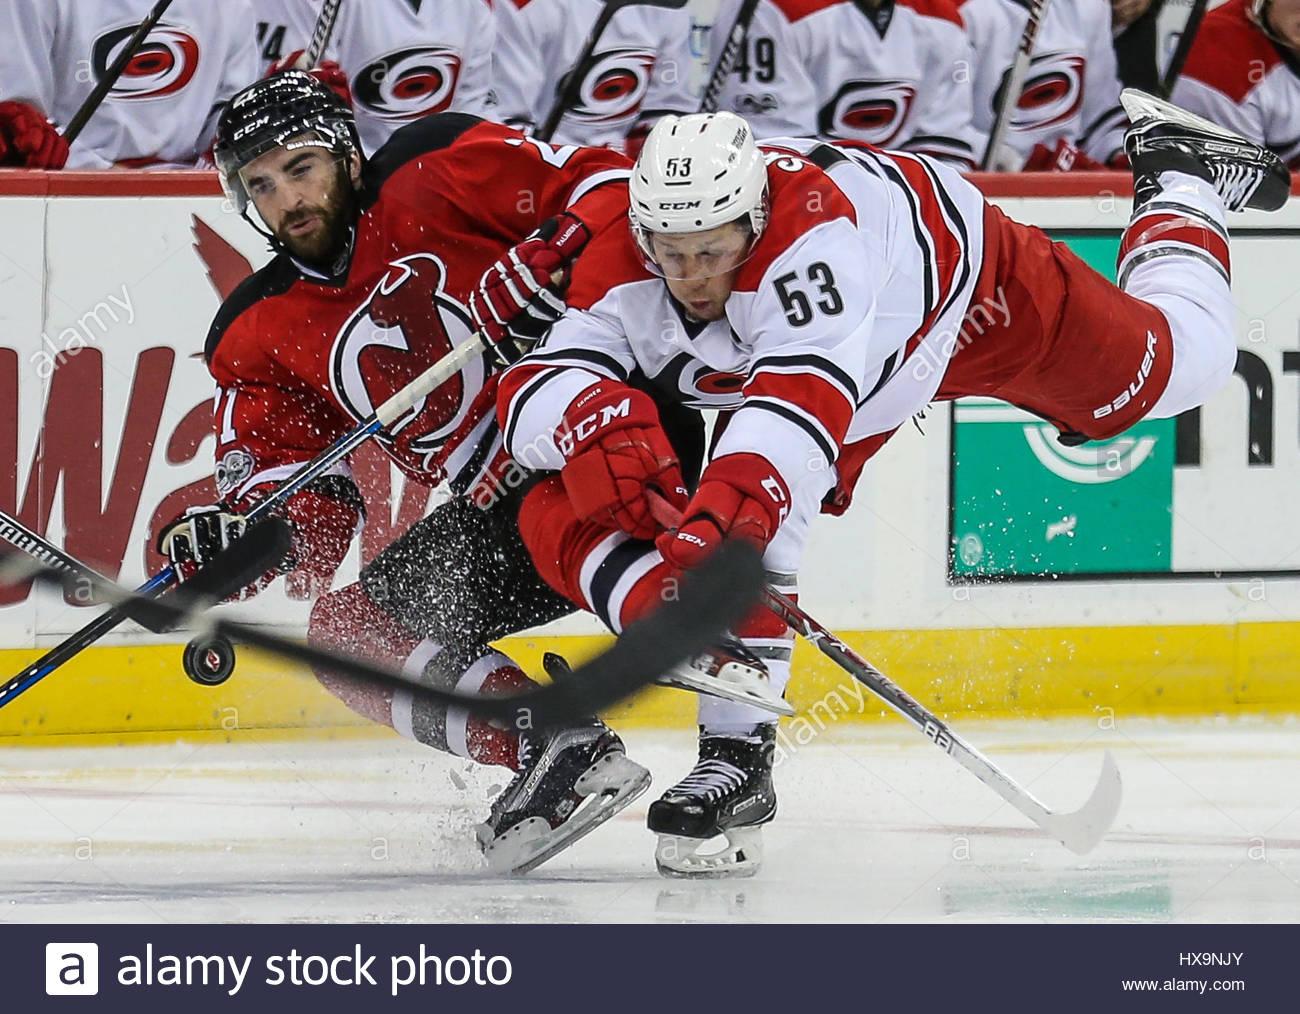 23642d82782 ... Kyle Palmieri (21) Newark, NJ, USA. 25th Mar, 2017. New Jersey Devils  right wing ...